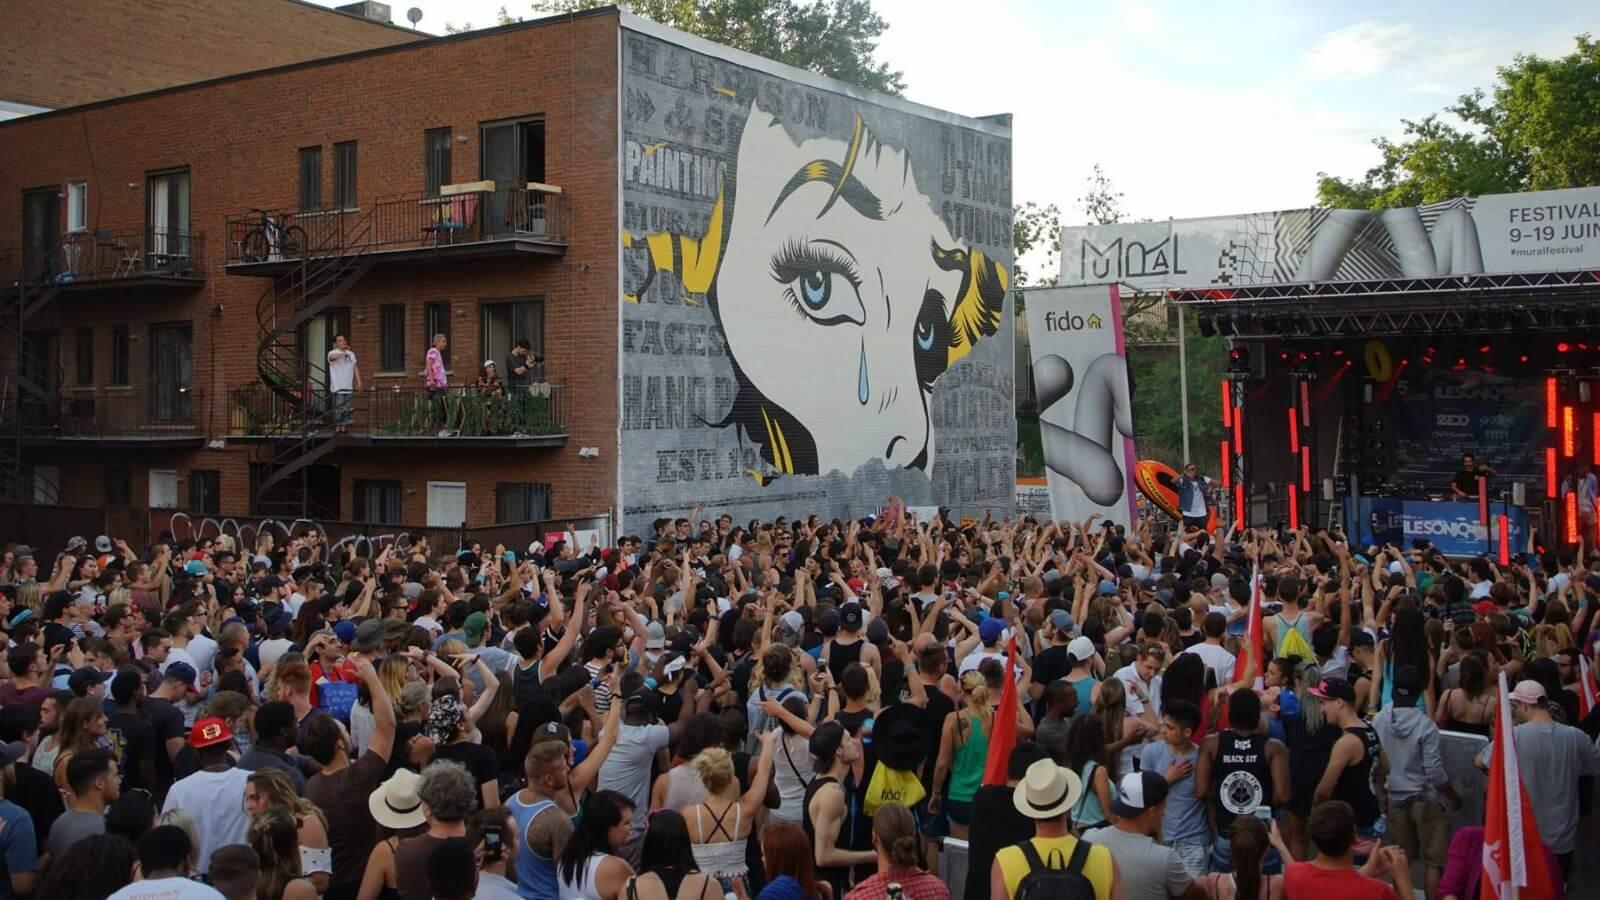 ¡All City Canvas hará cobertura especial de Mural Festival para Latinoamérica! ?